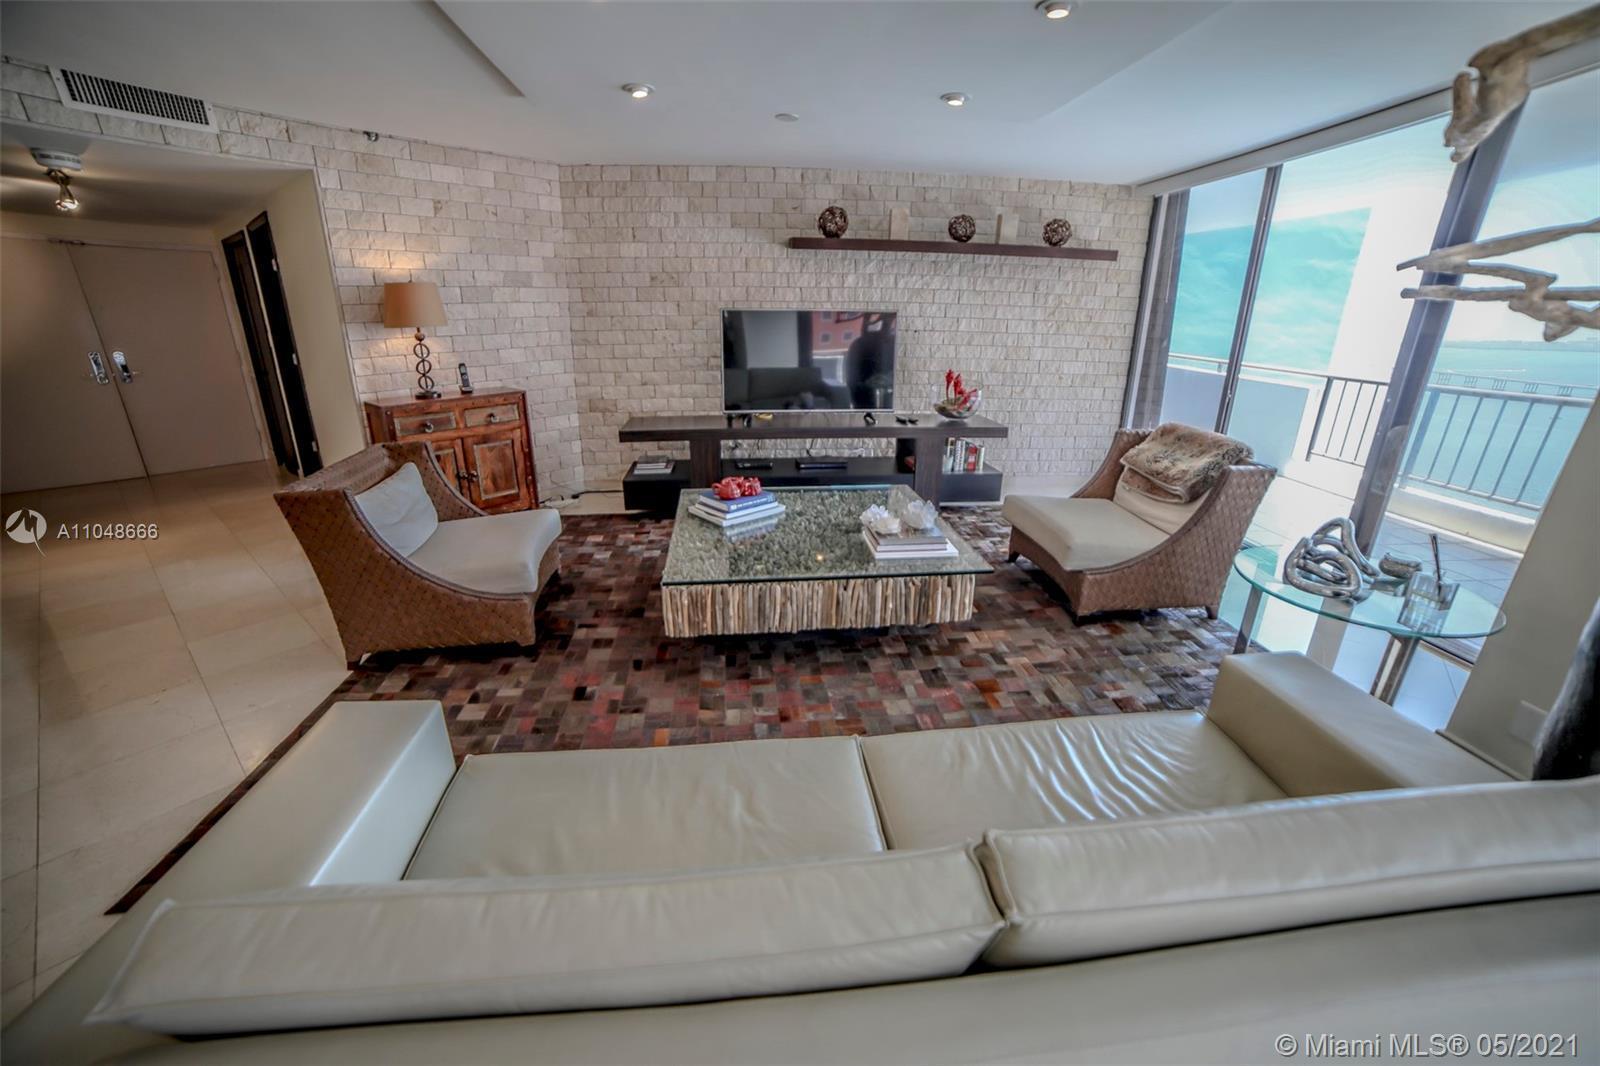 Exquisite 1895 sq.ft. three bedroom/three bathroom apartment overlooking Biscayne Bay in the prestig